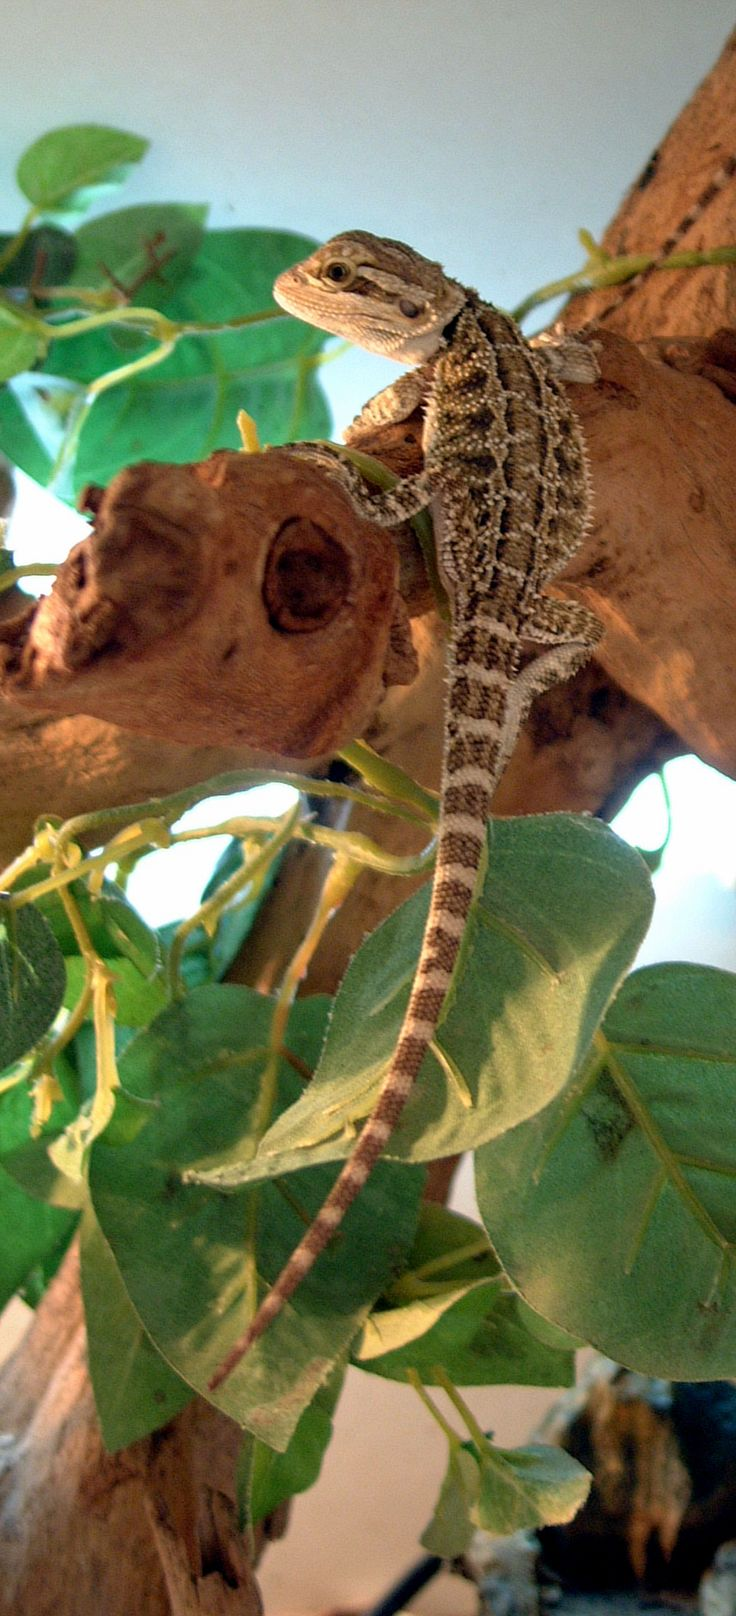 17 Best Images About Reptiles Amphibians On Pinterest Python